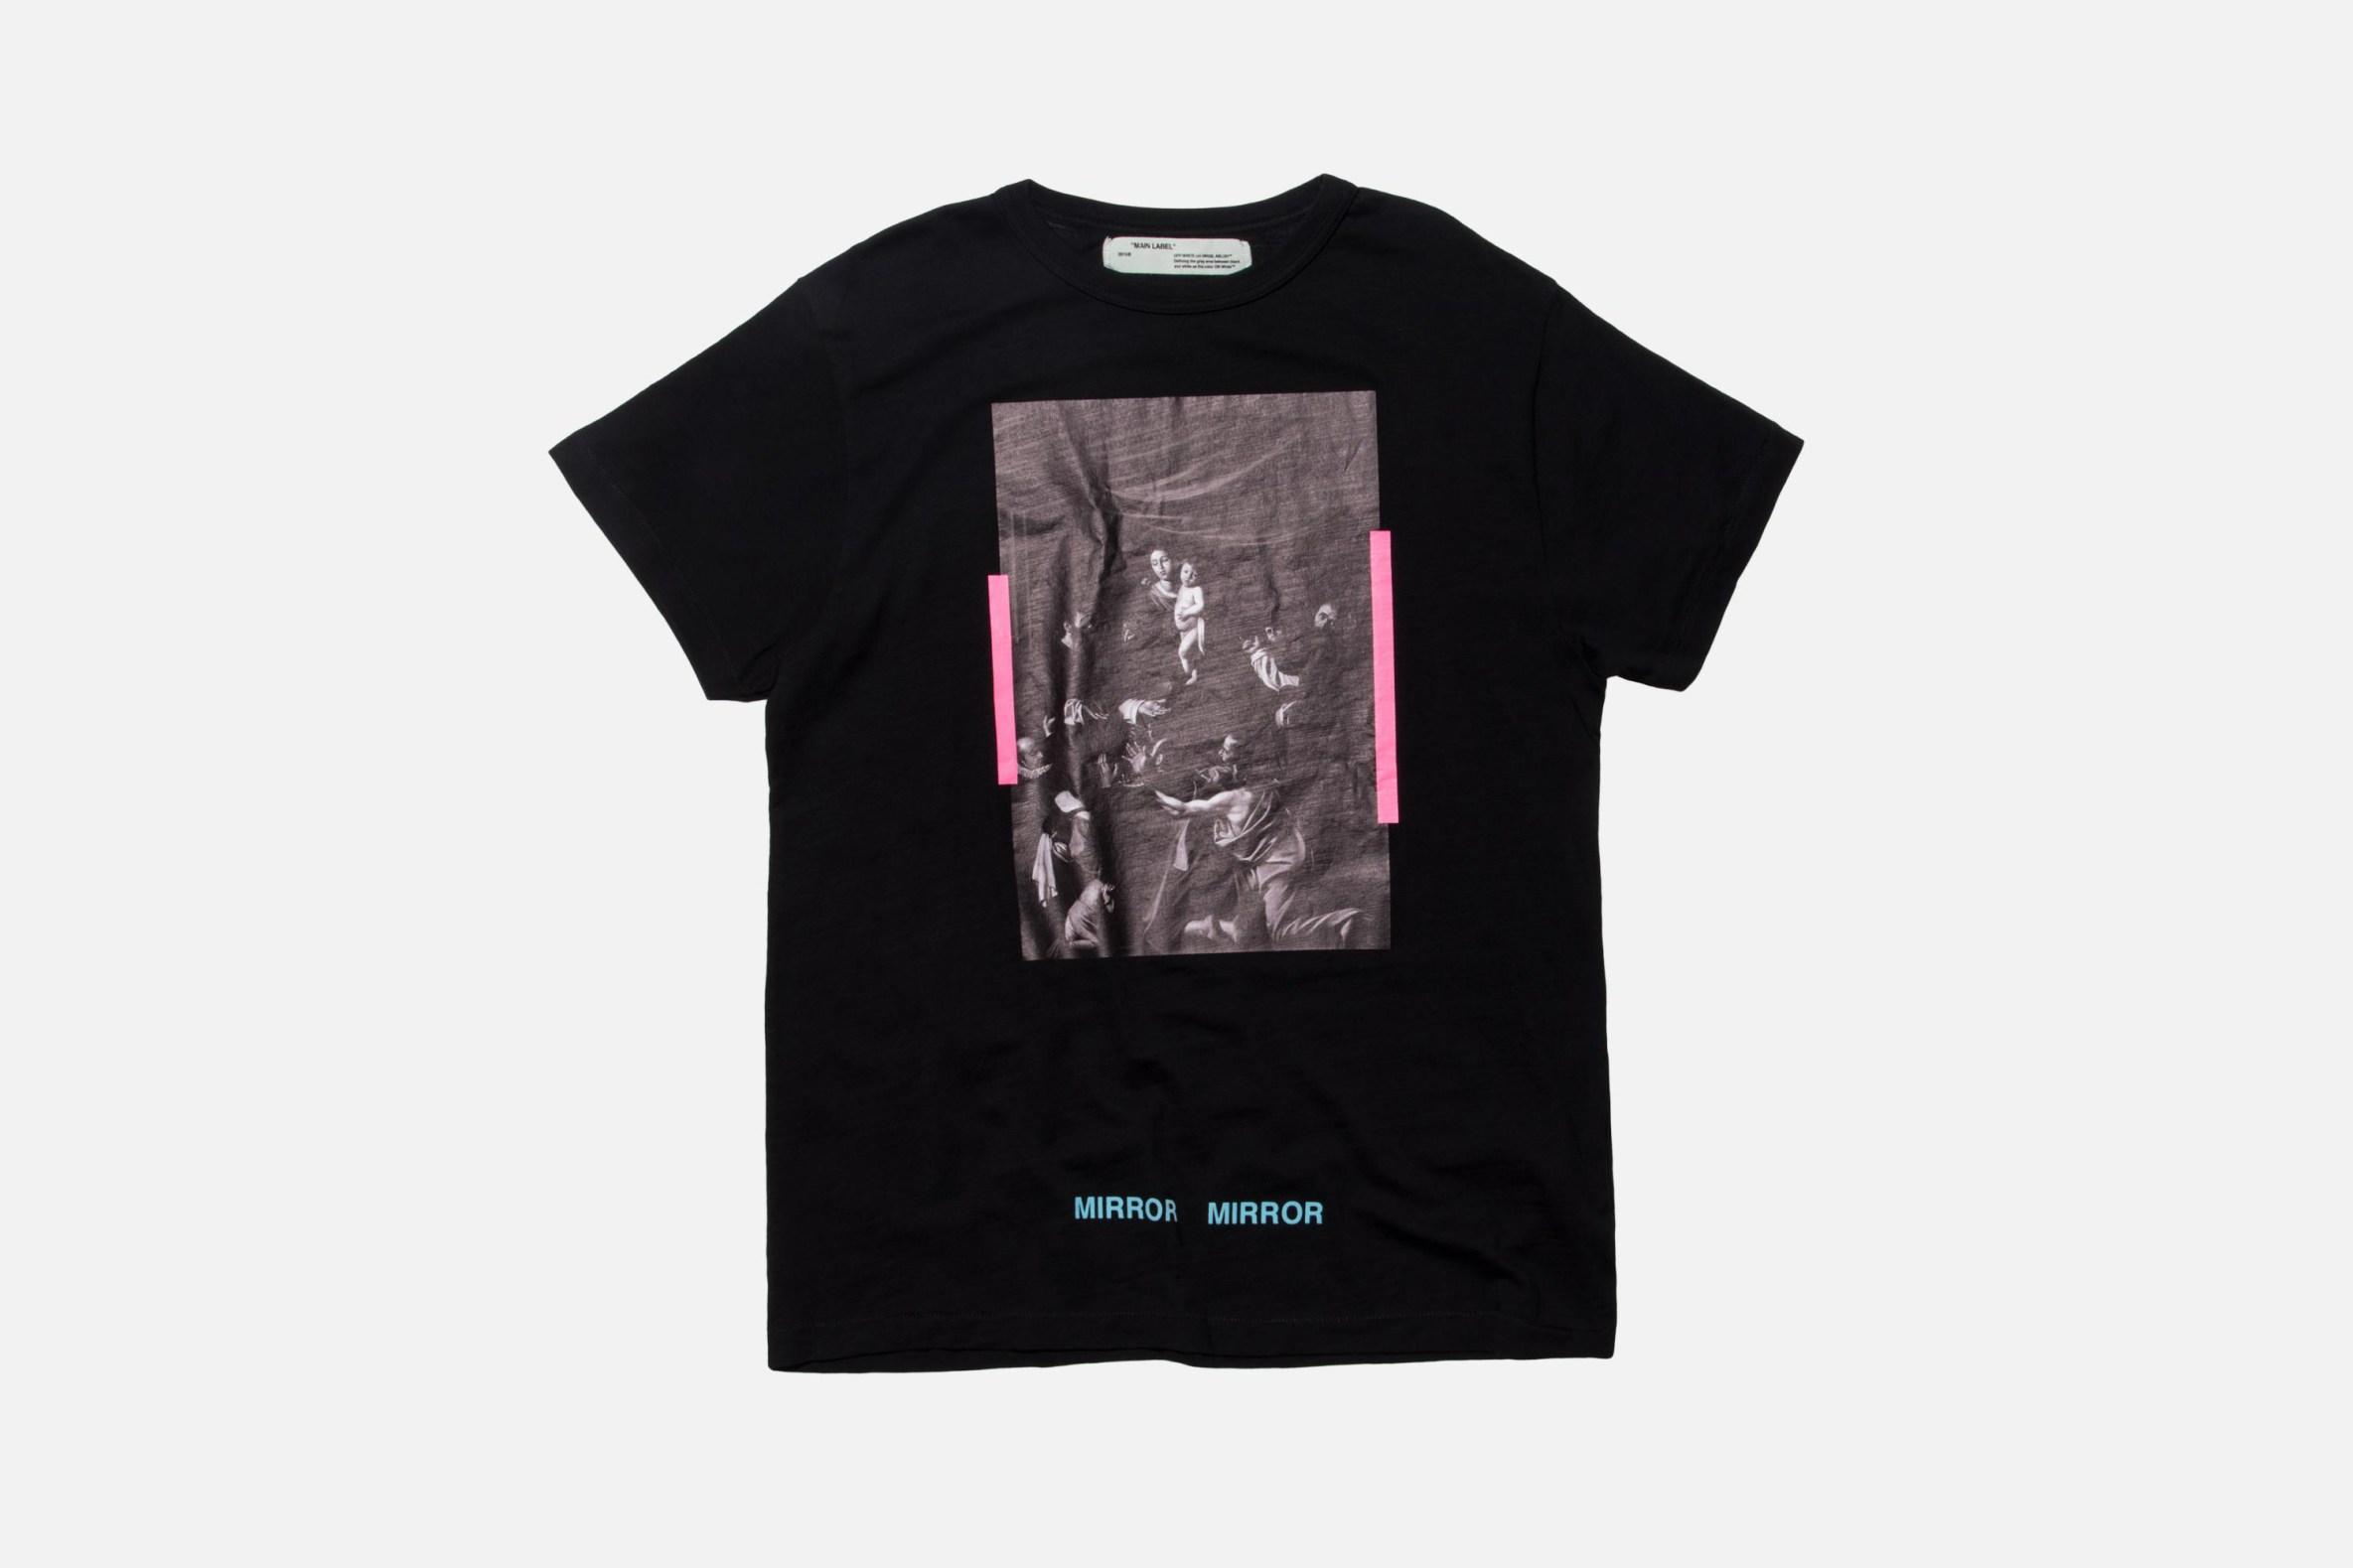 off-white-mirror-mirror-t-shirts-buy-now-5